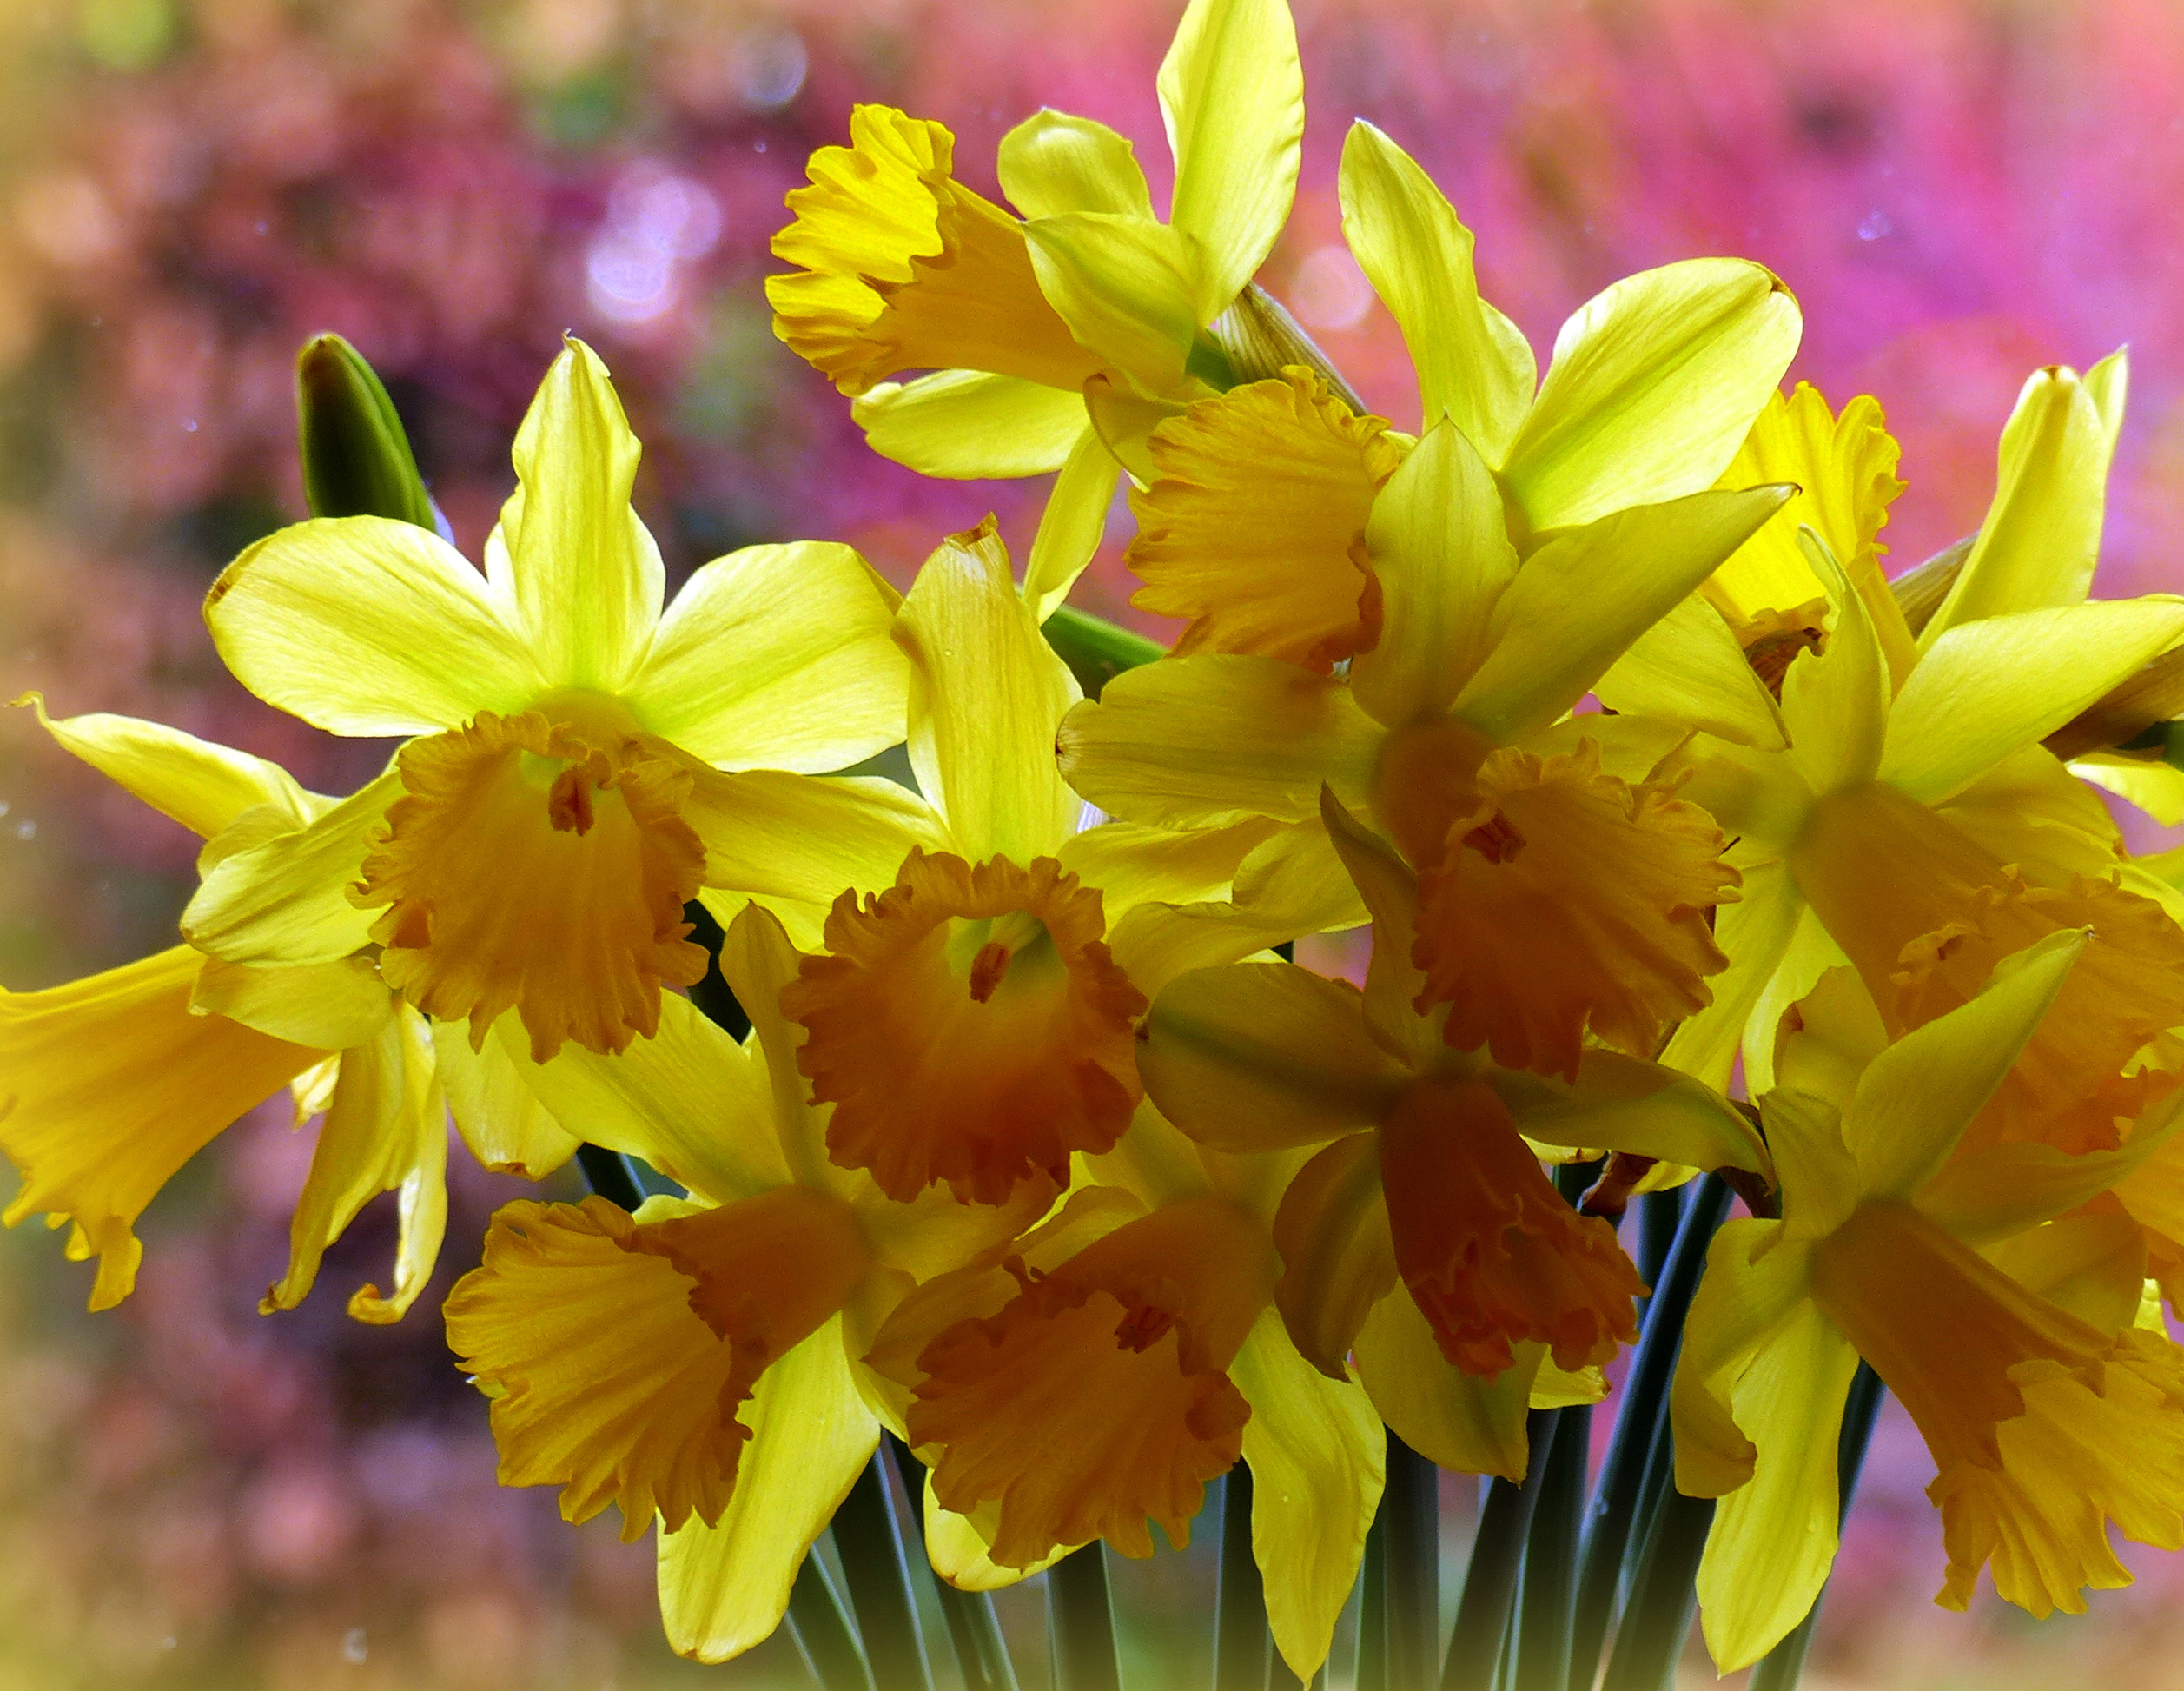 daffodils-photo-50